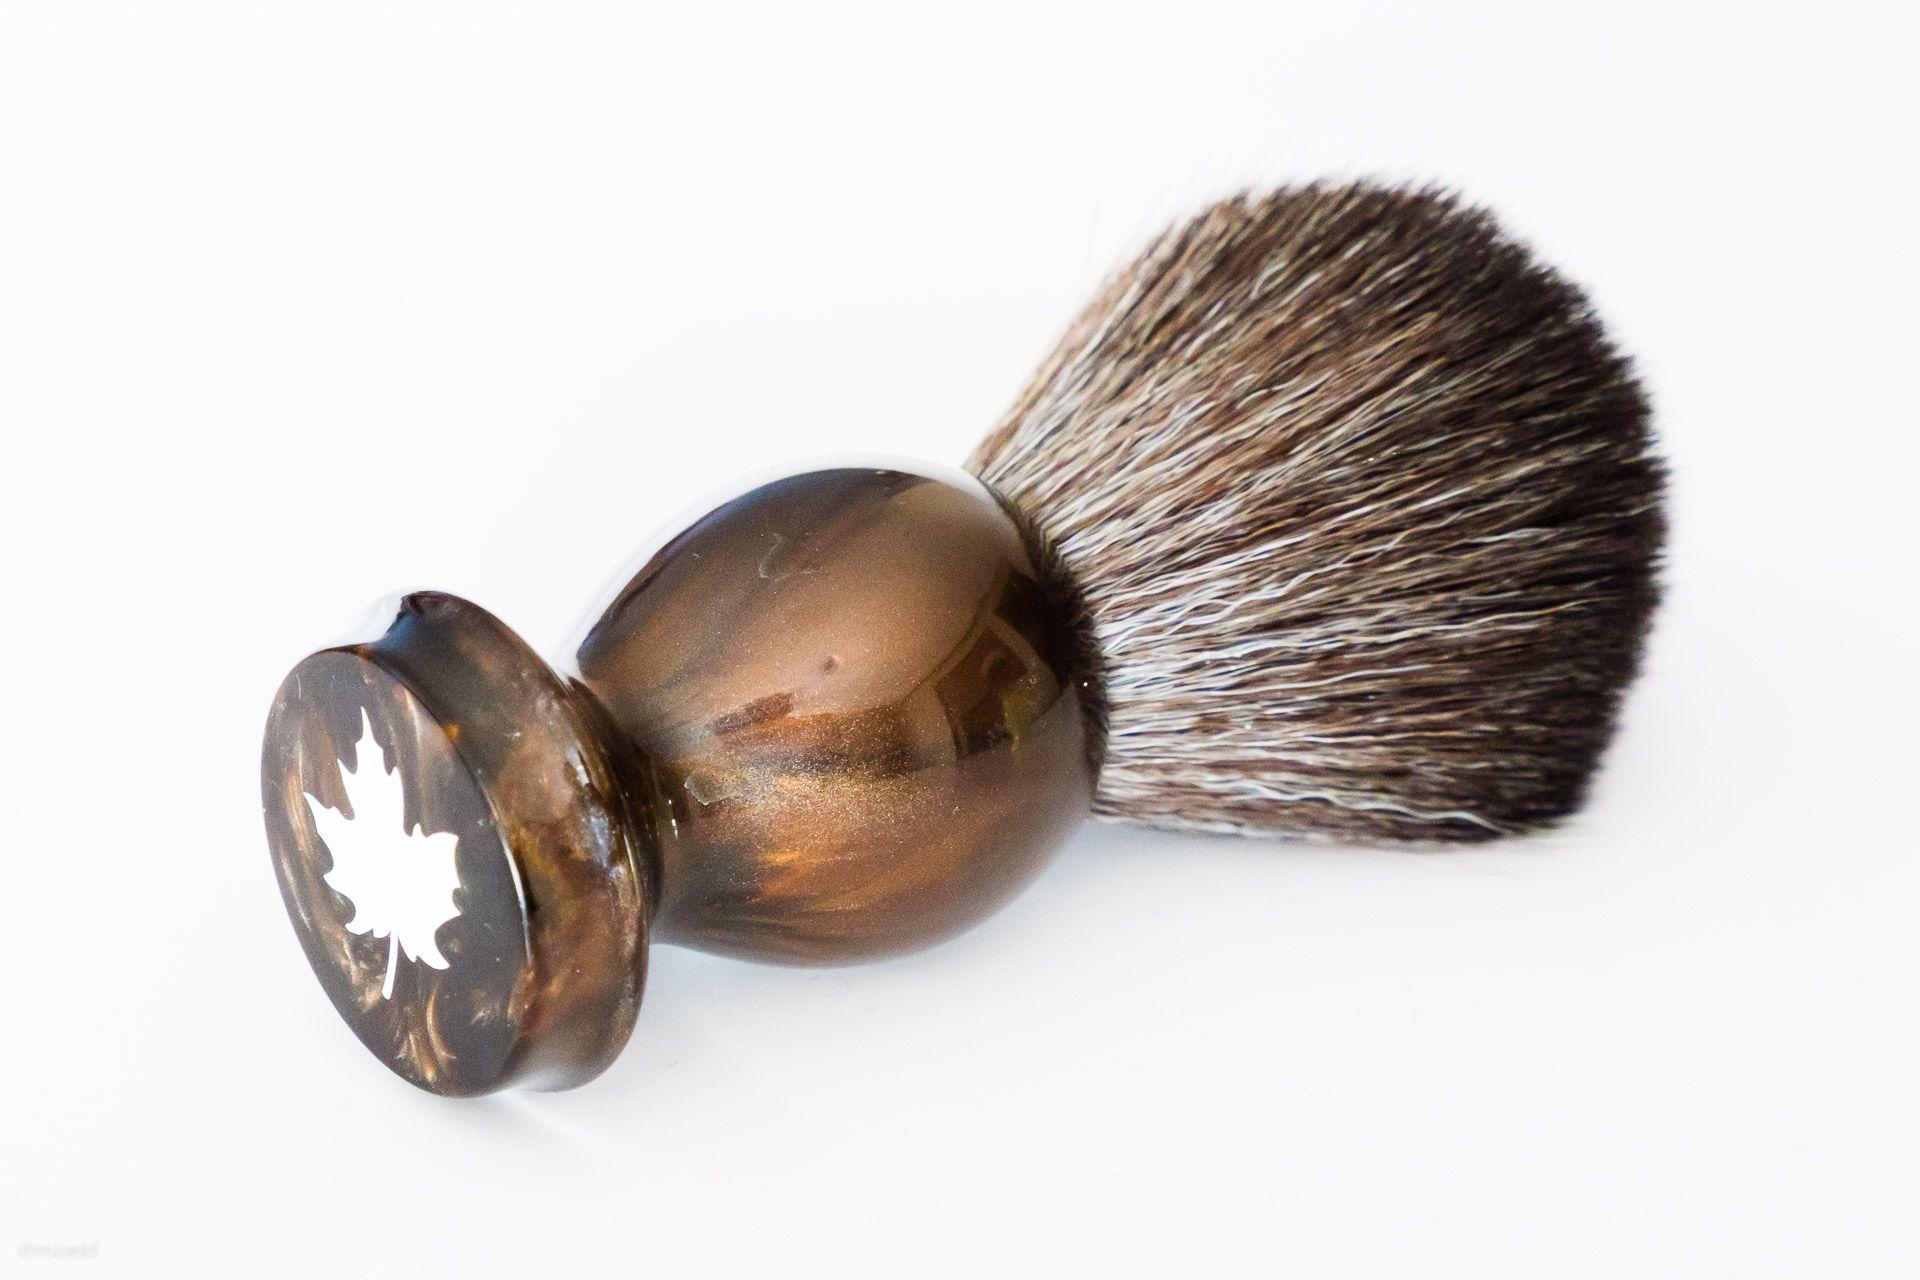 Pędzel do golenia Maggard Razors 22 mm Black Synthetic Shaving Brush, Bronze Handle